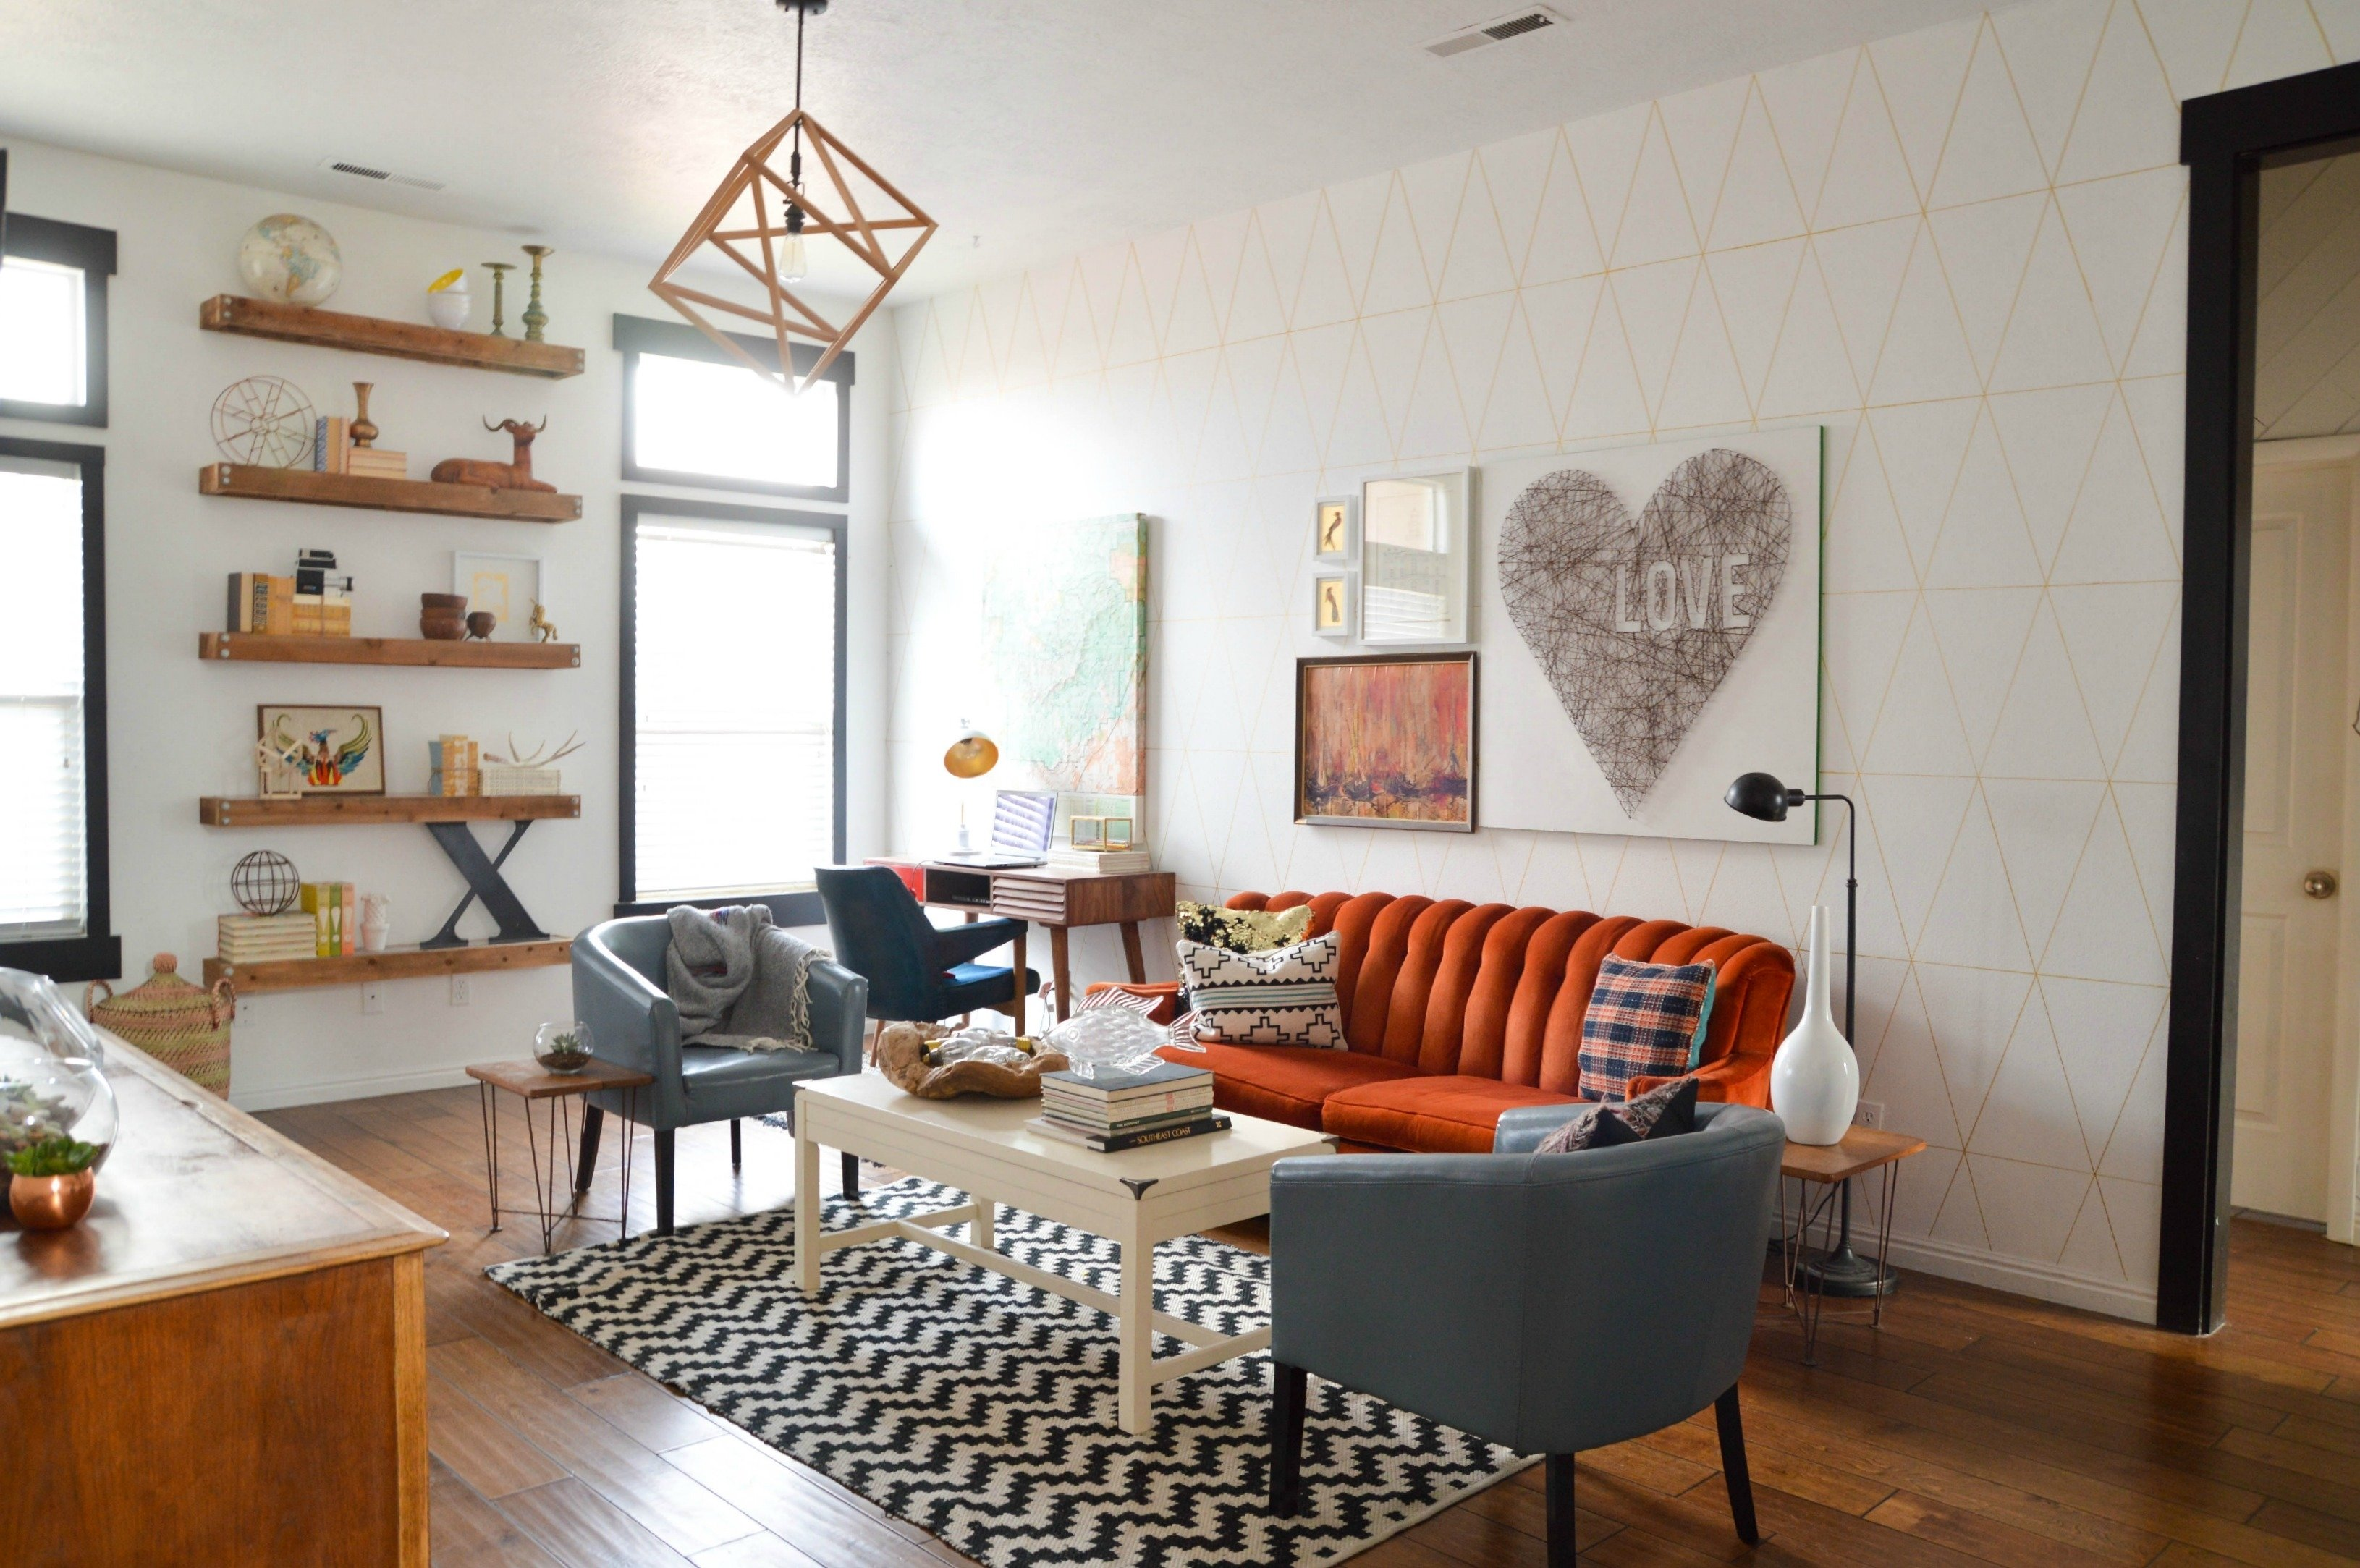 10 Amazing Mid Century Modern Living Room Ideas transform mid century modern living room minimalist with mid century 2020